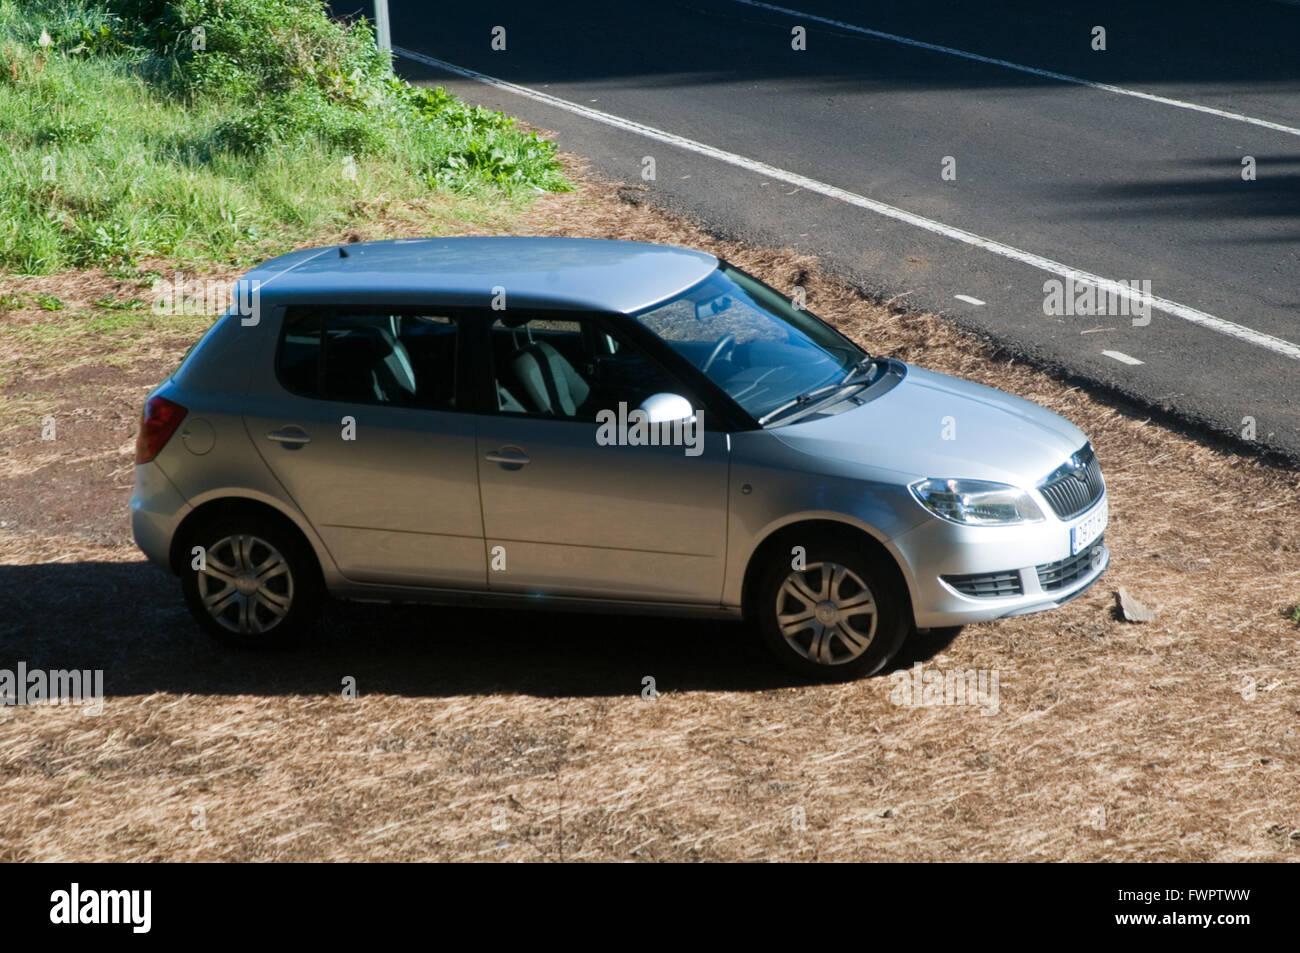 skoda fabia small family car Polish cars maker makers VW volkswagen - Stock Image